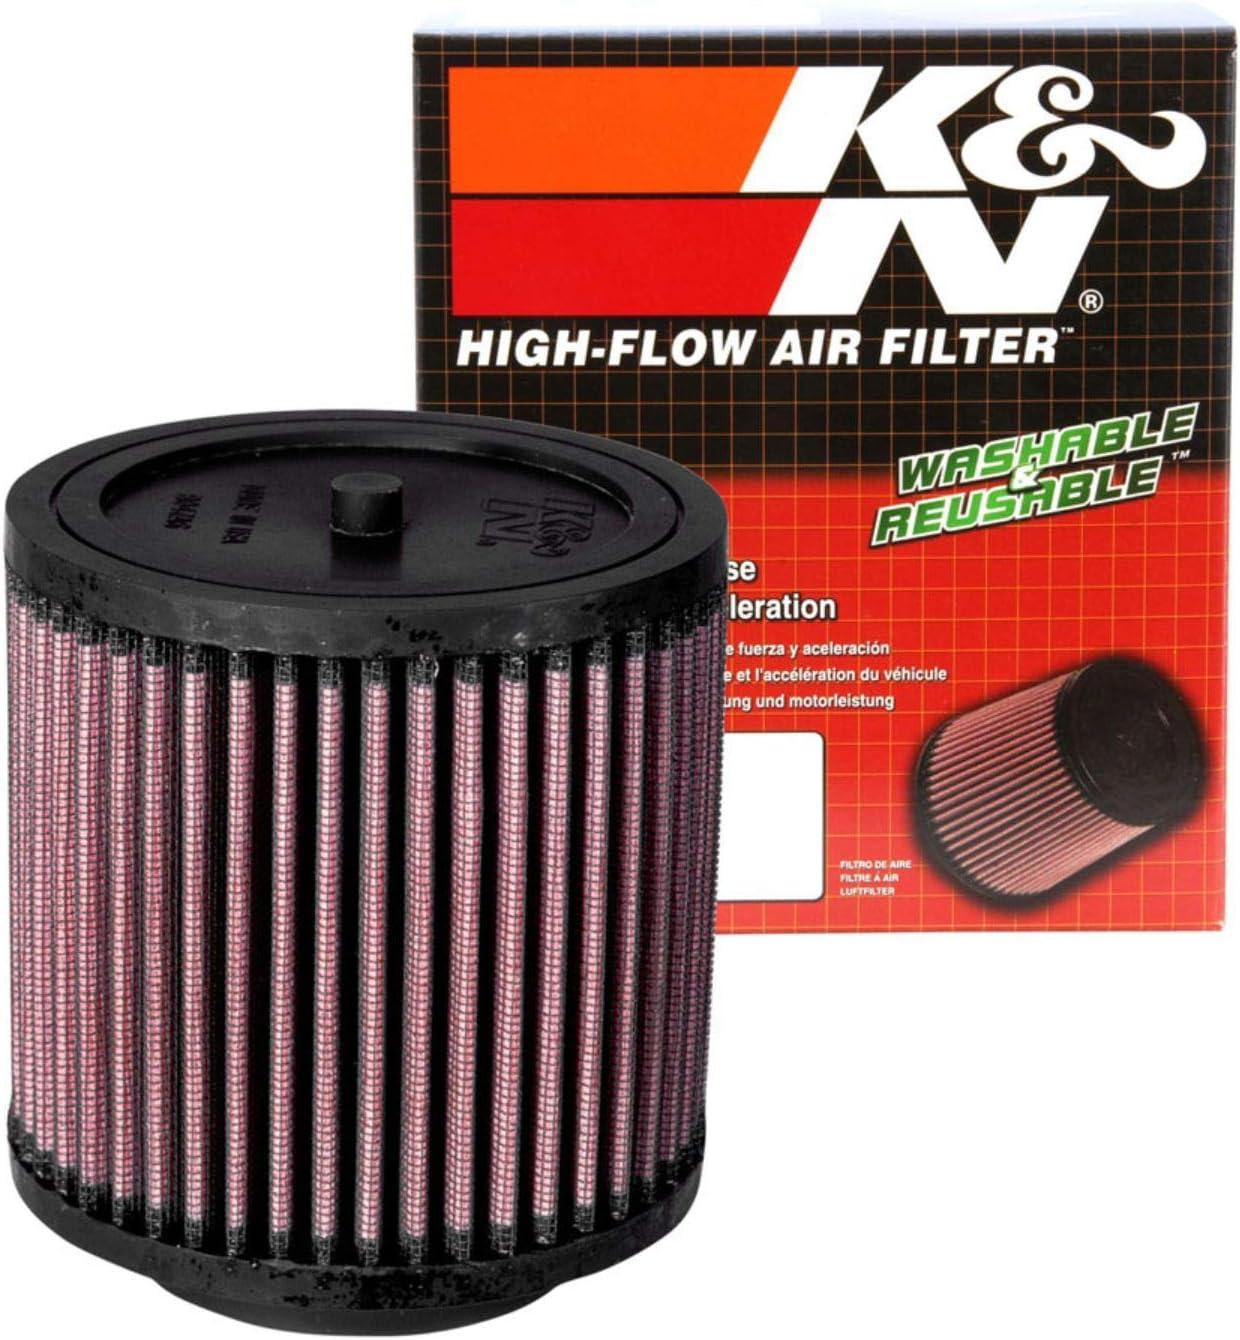 UNI Air Filter for ATV//UTV HONDA TRX500TM FourTrax Foreman 2005-2006